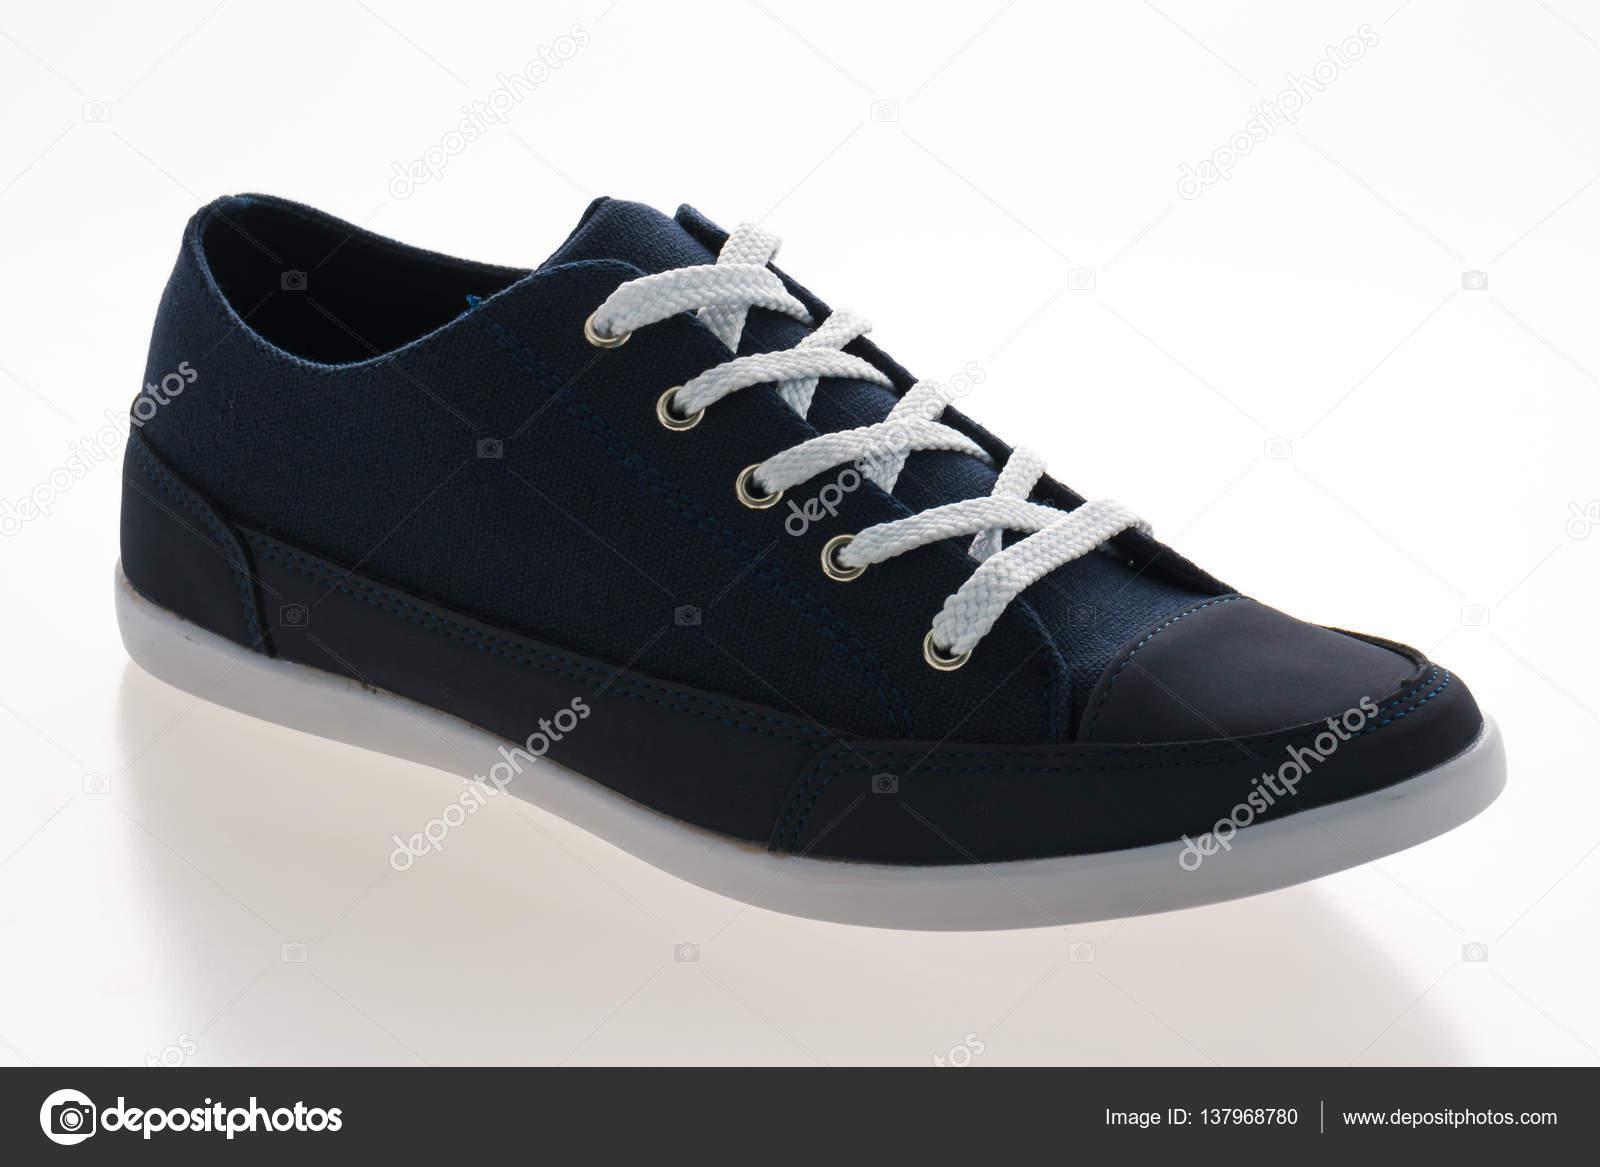 ed9fda2efc0 Ανδρών μόδας παπούτσια που απομονώνονται σε λευκό φόντο — Εικόνα από  mrsiraphol